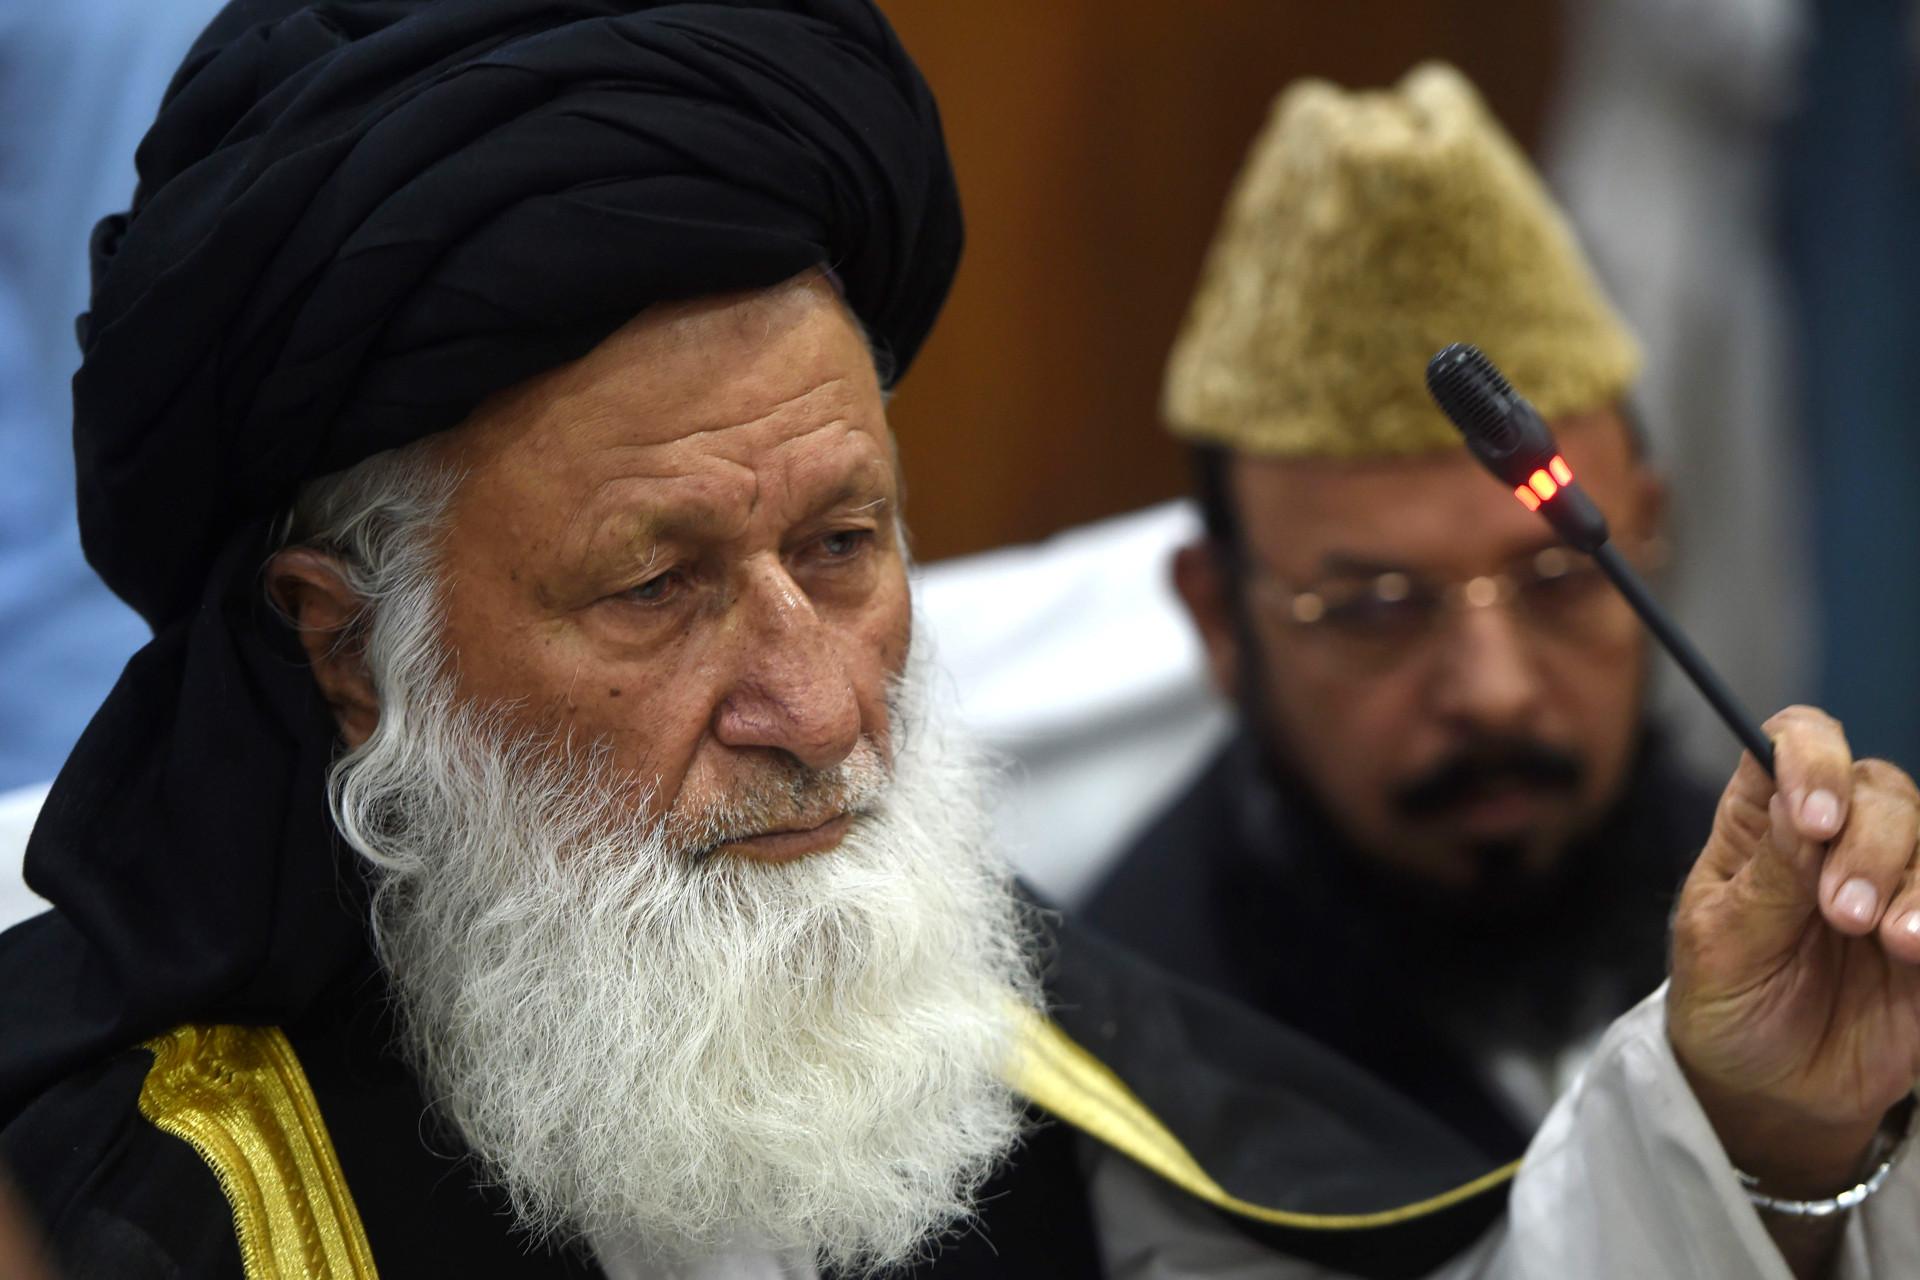 Muslim Cleric Muhammad Khan Sherani